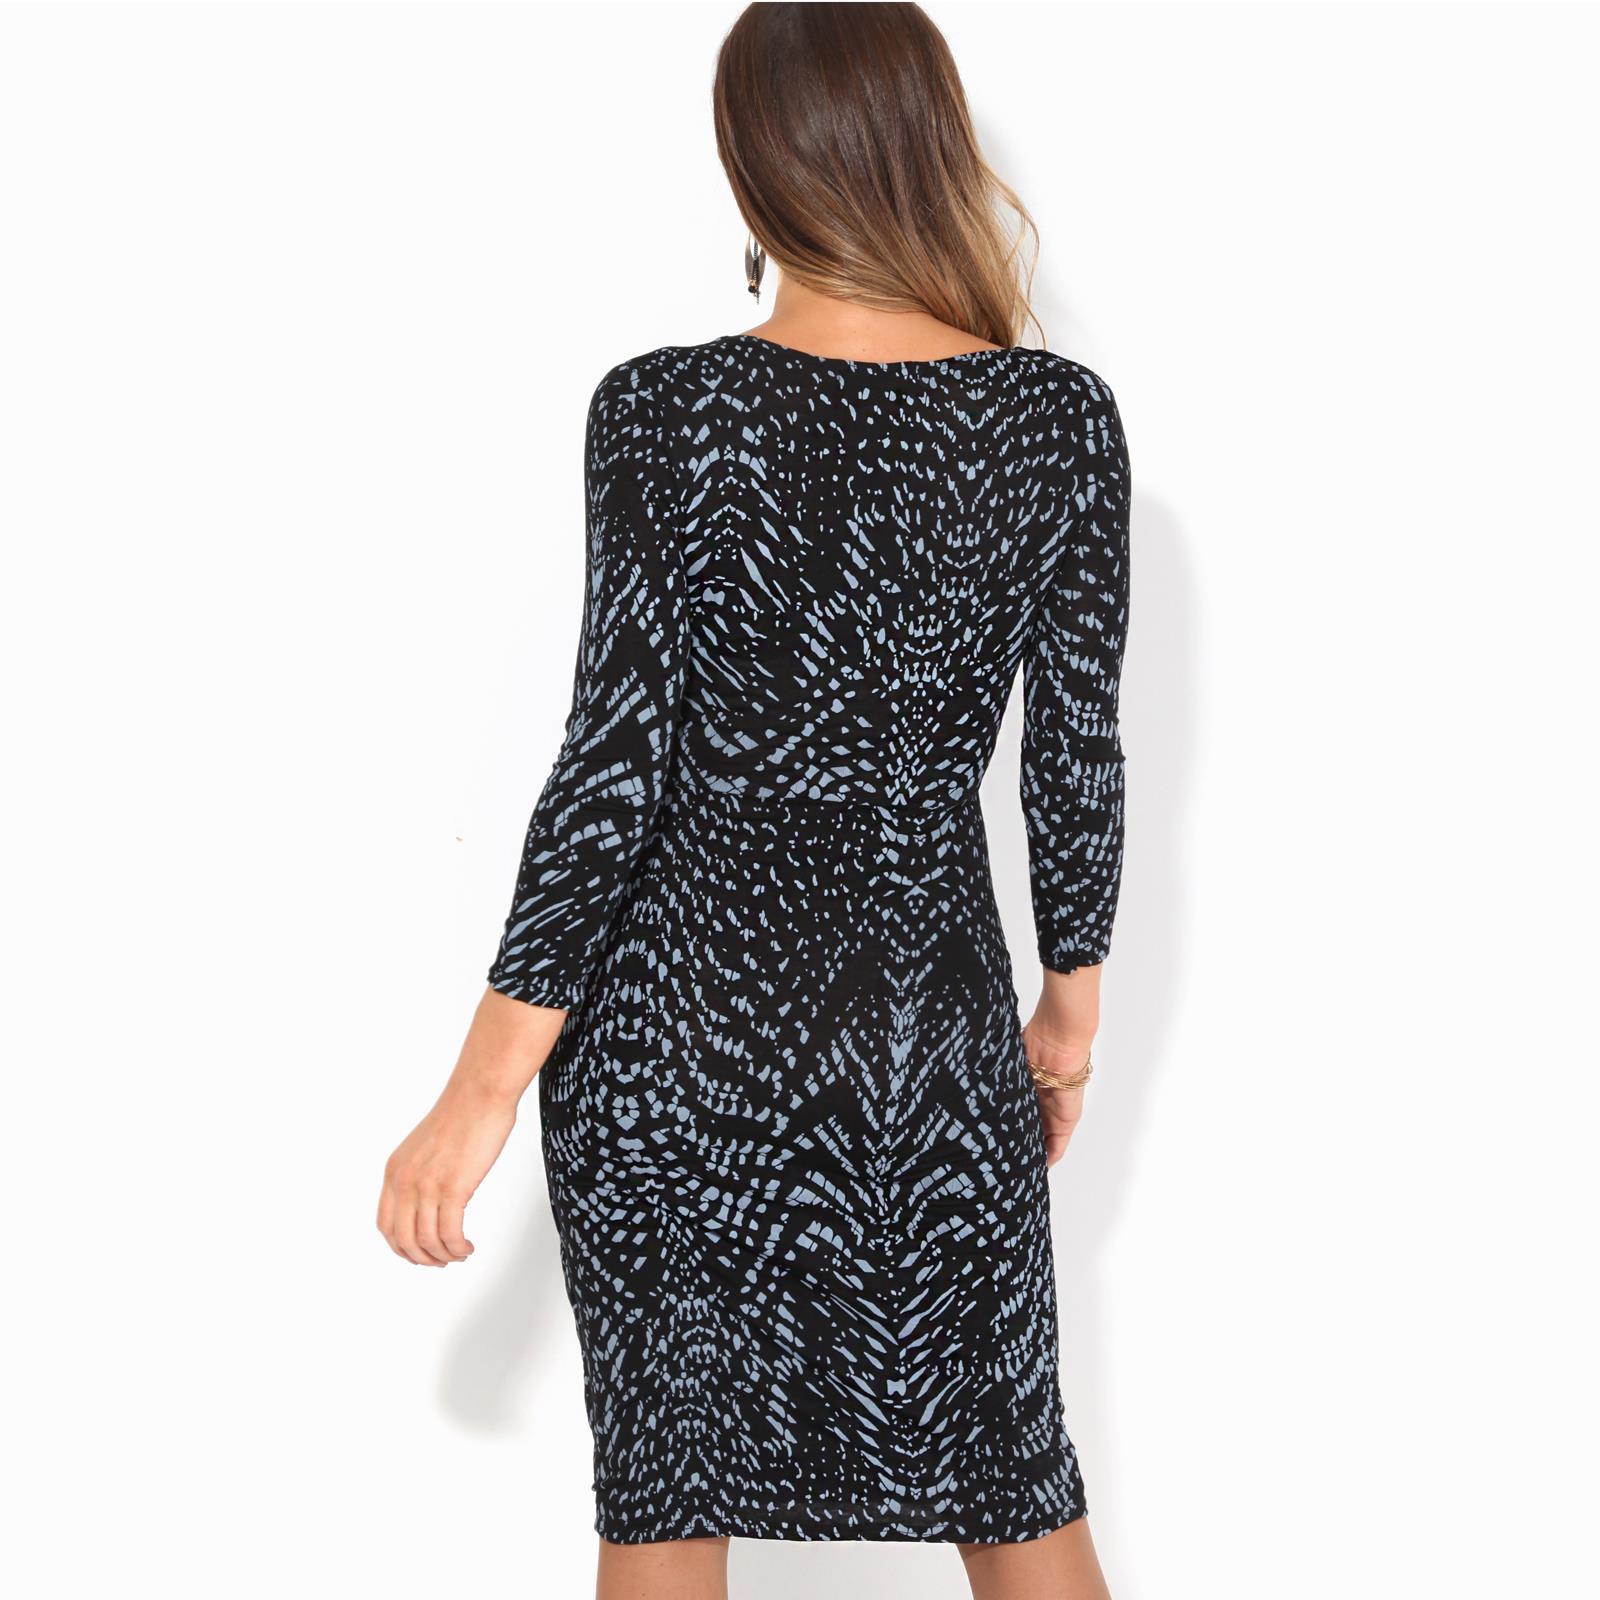 Womens-V-Neck-Dress-Top-Bodycon-Skirt-Midi-Snakeskin-Print-Cross-Over-Party-Wrap thumbnail 10